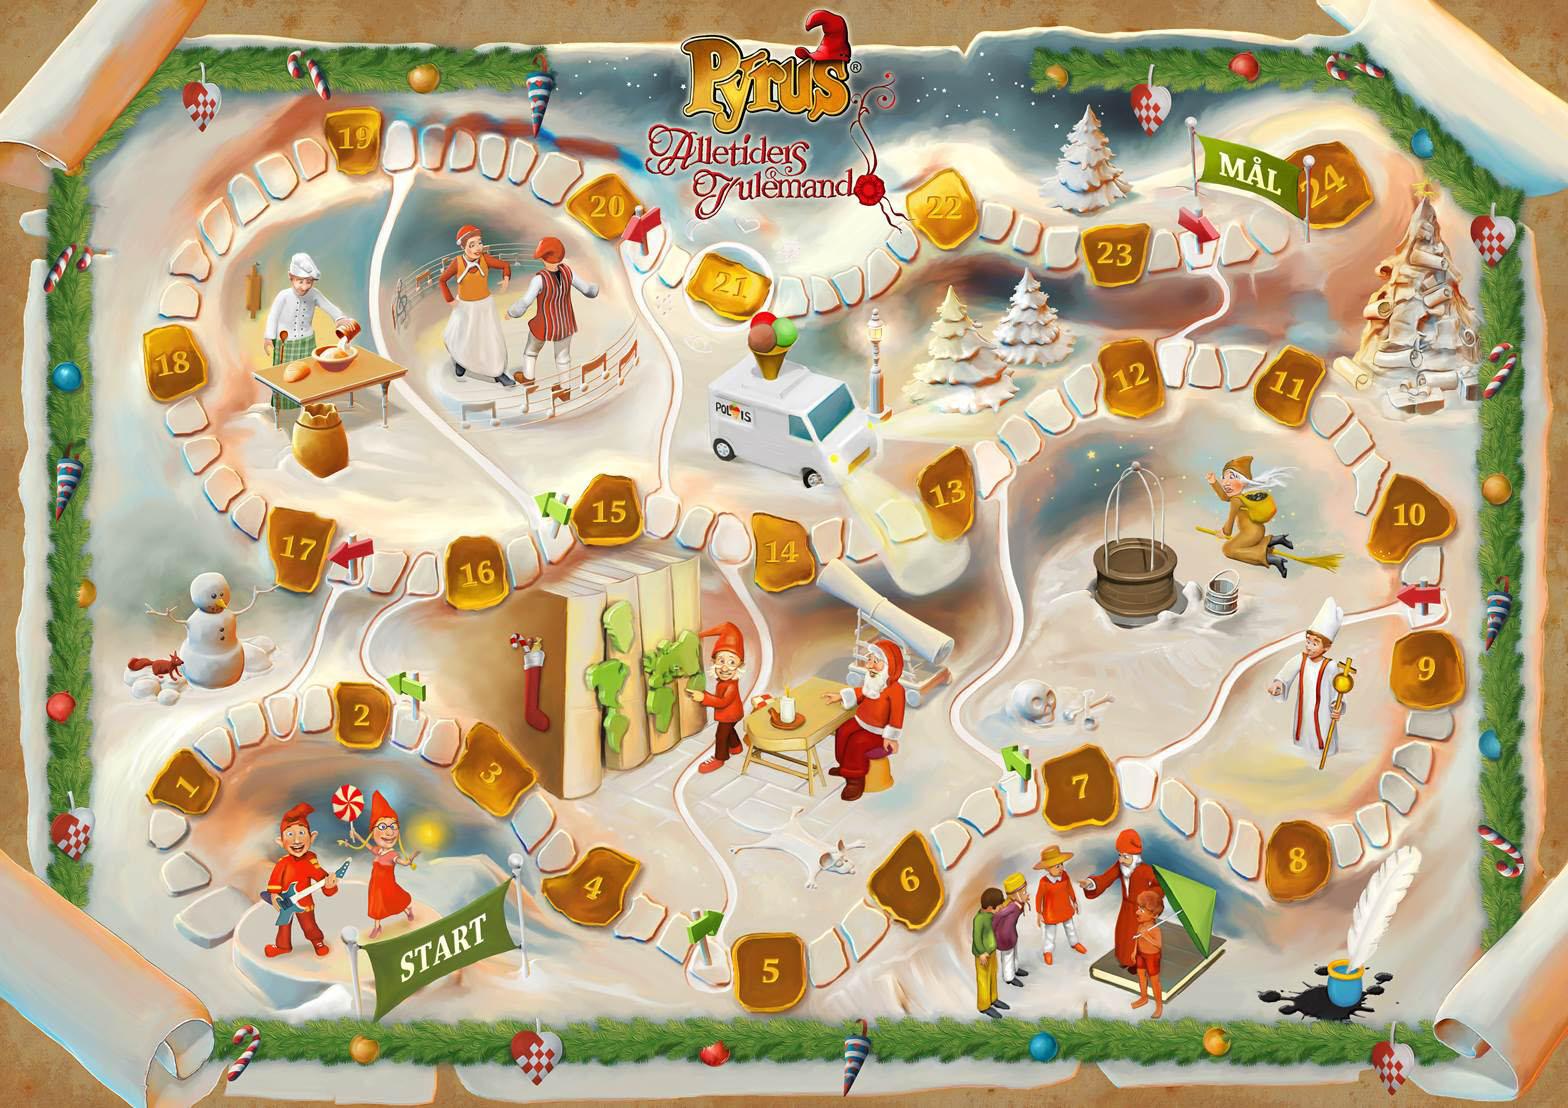 Alletiders Julemand Laagekalender 2014